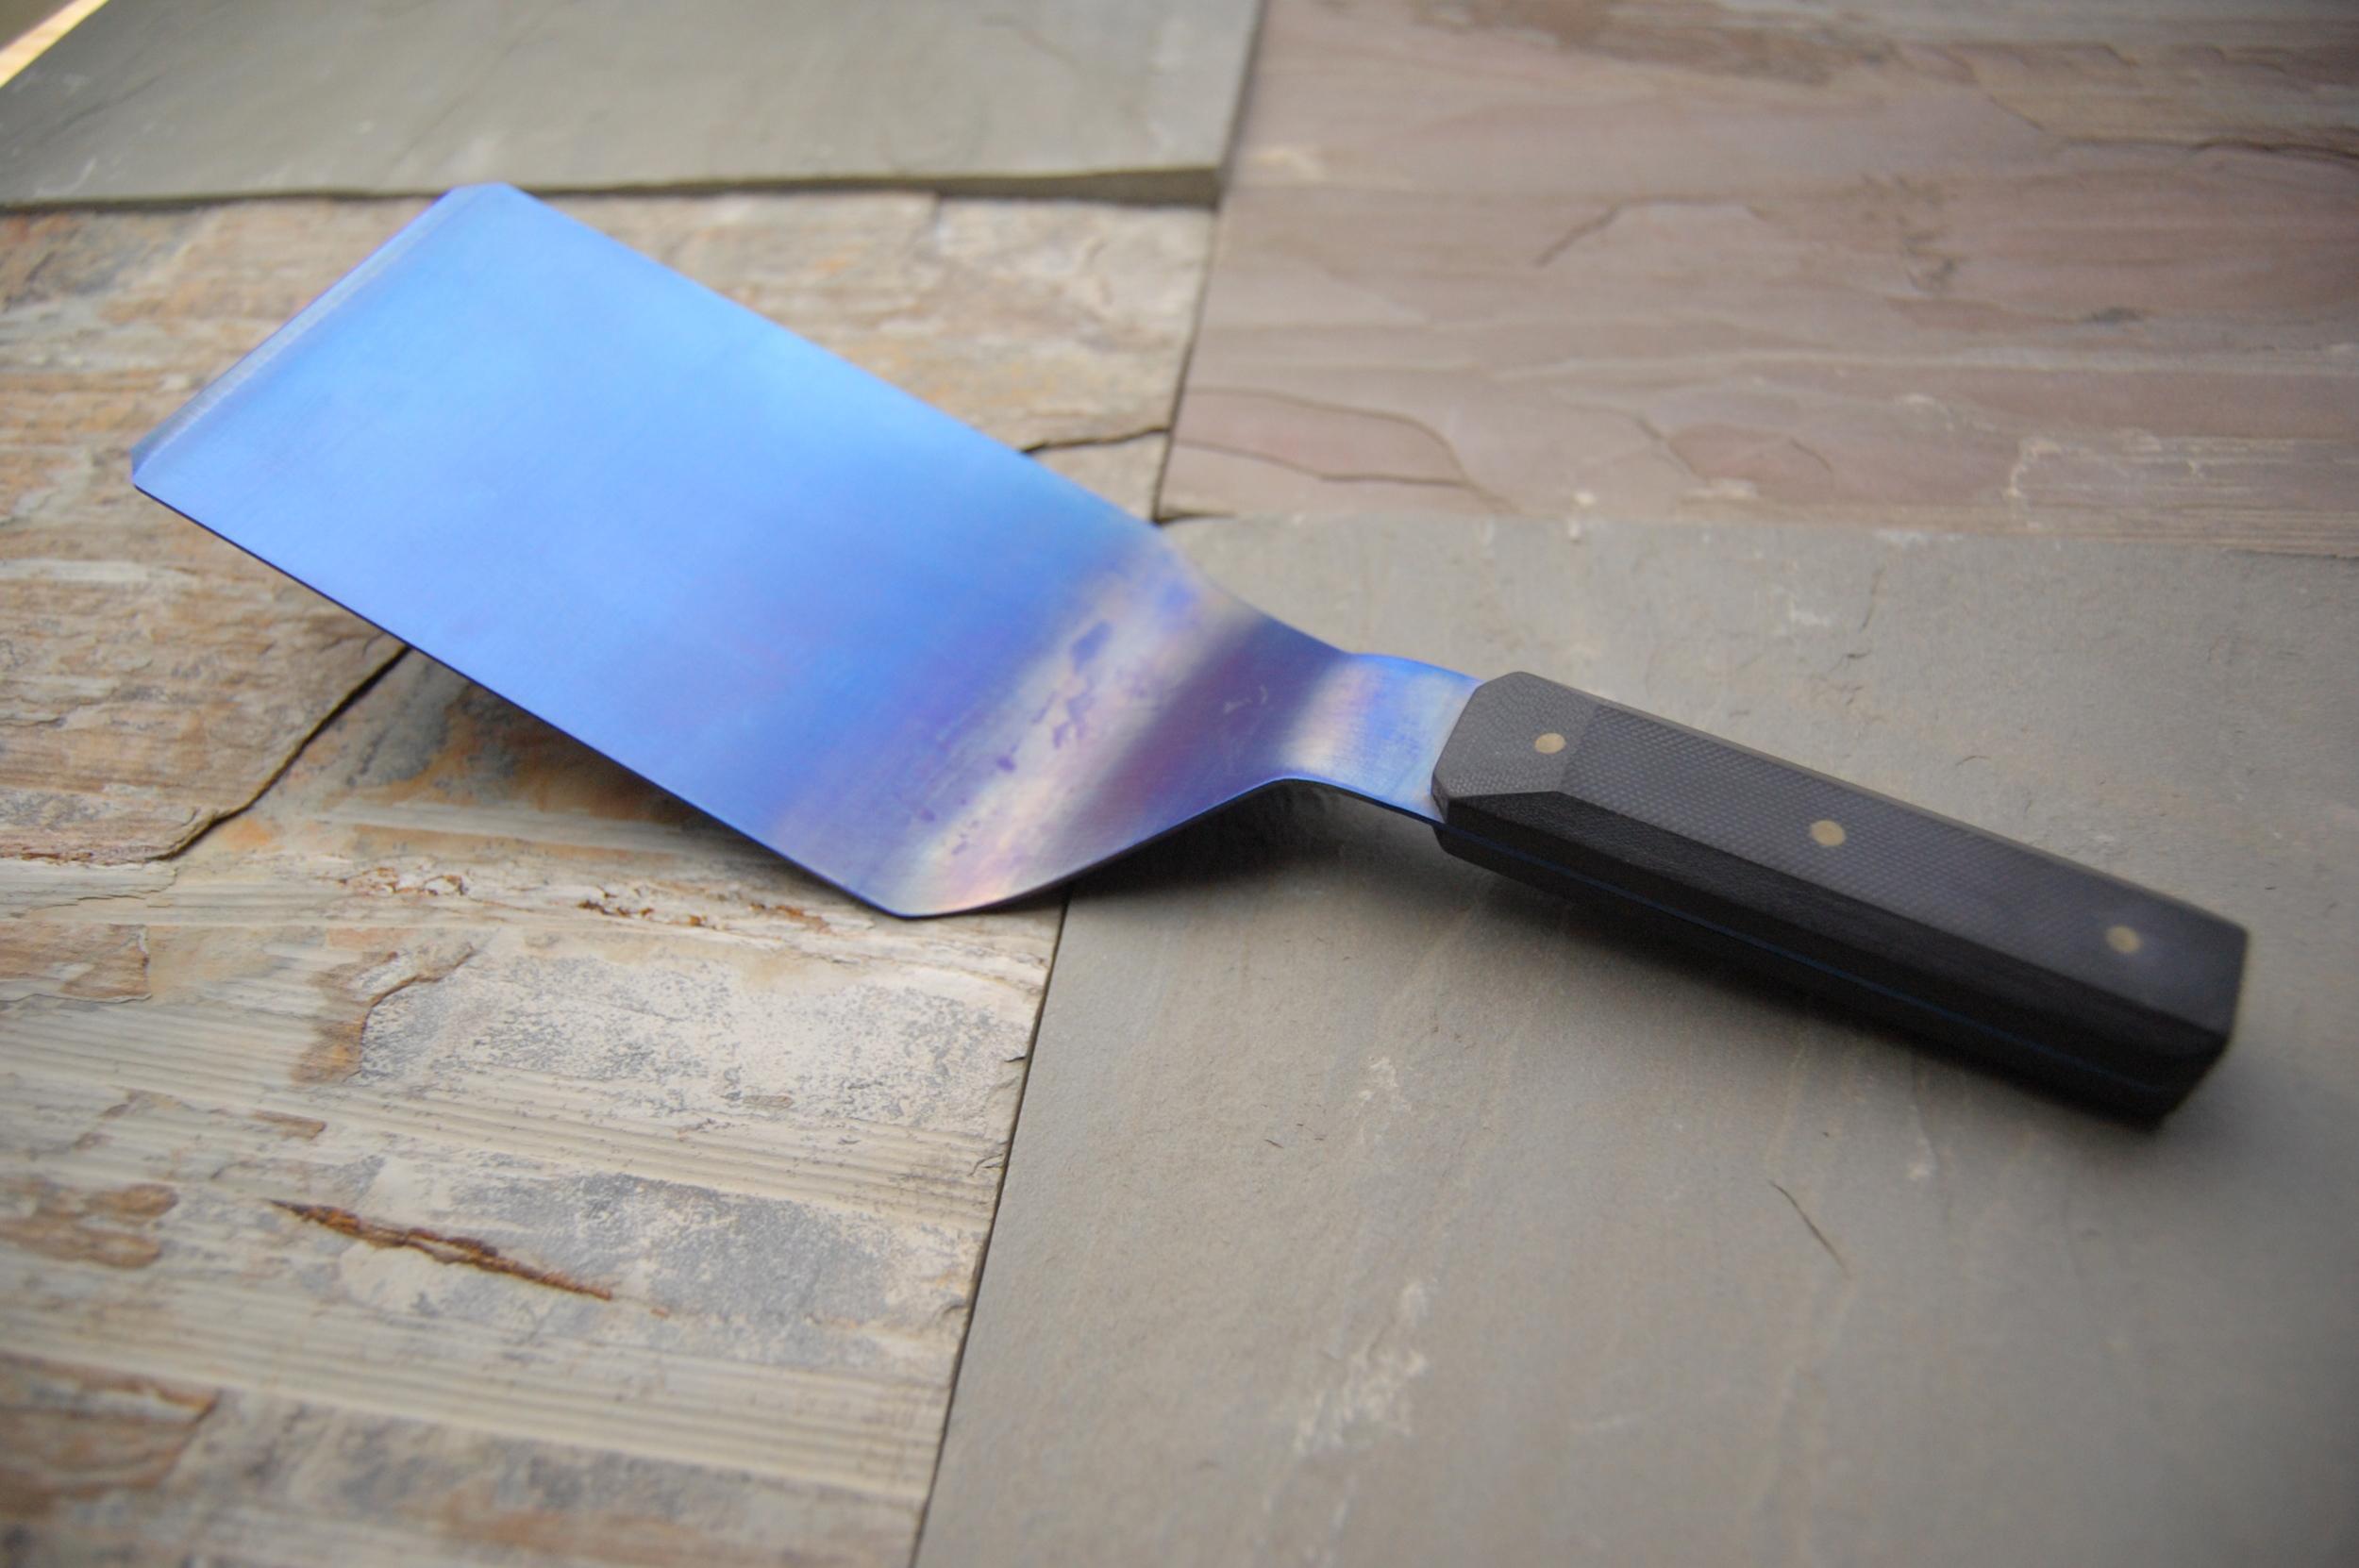 haburnknivesspatula02.JPG